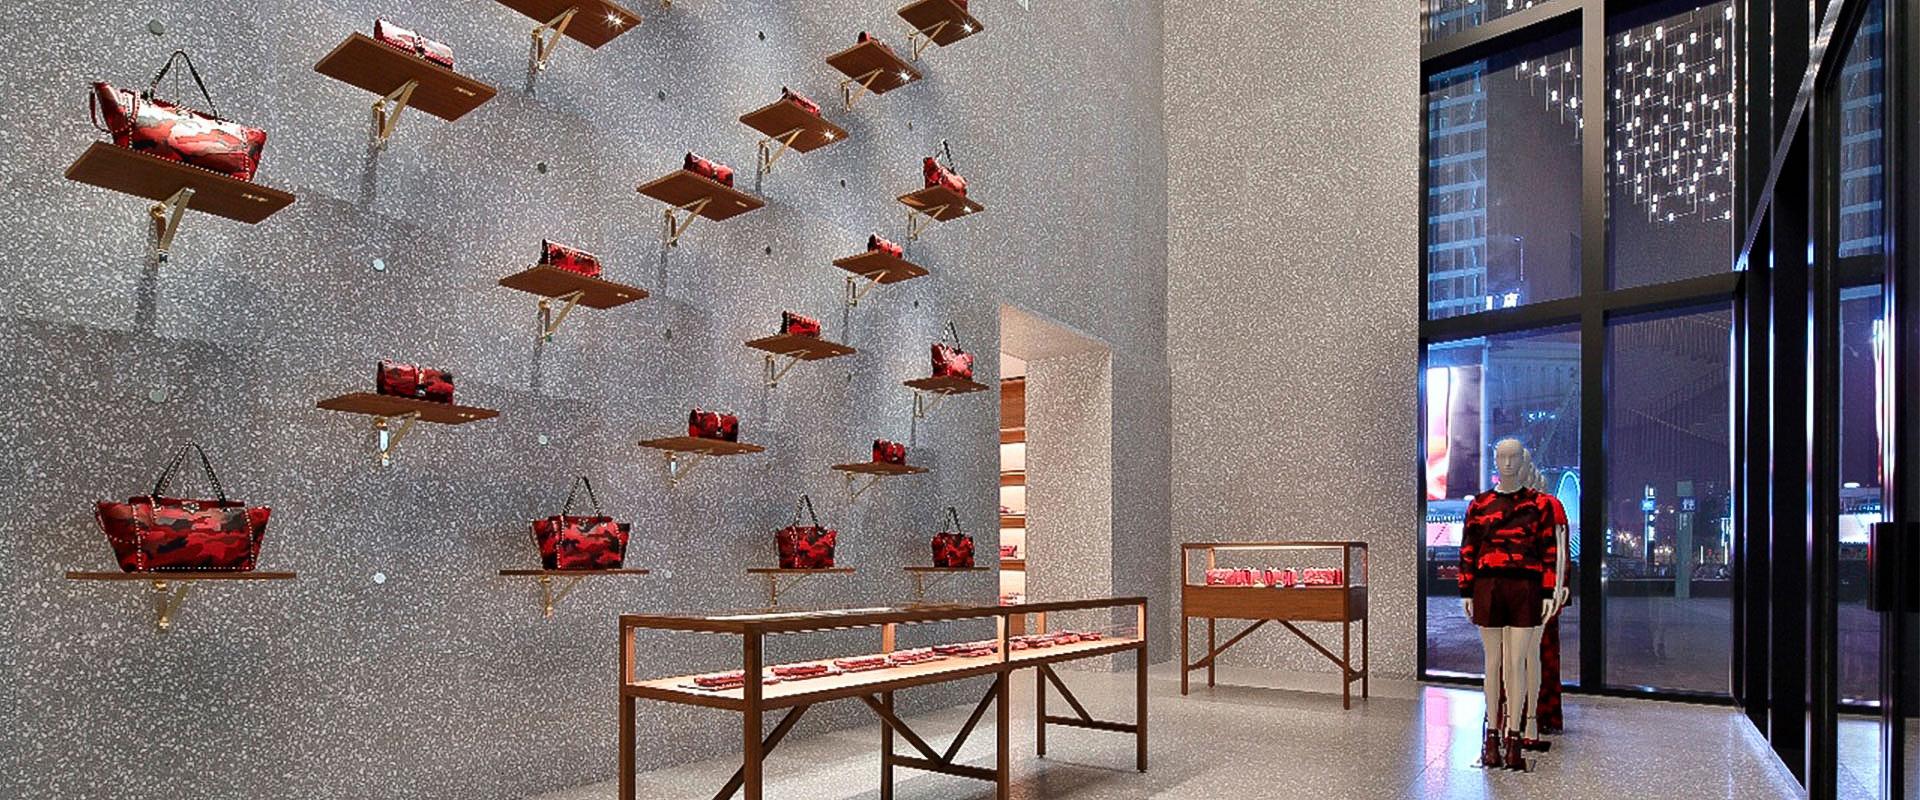 Valentino-shangai-china-custom-retail-rivestimenti-8-ok